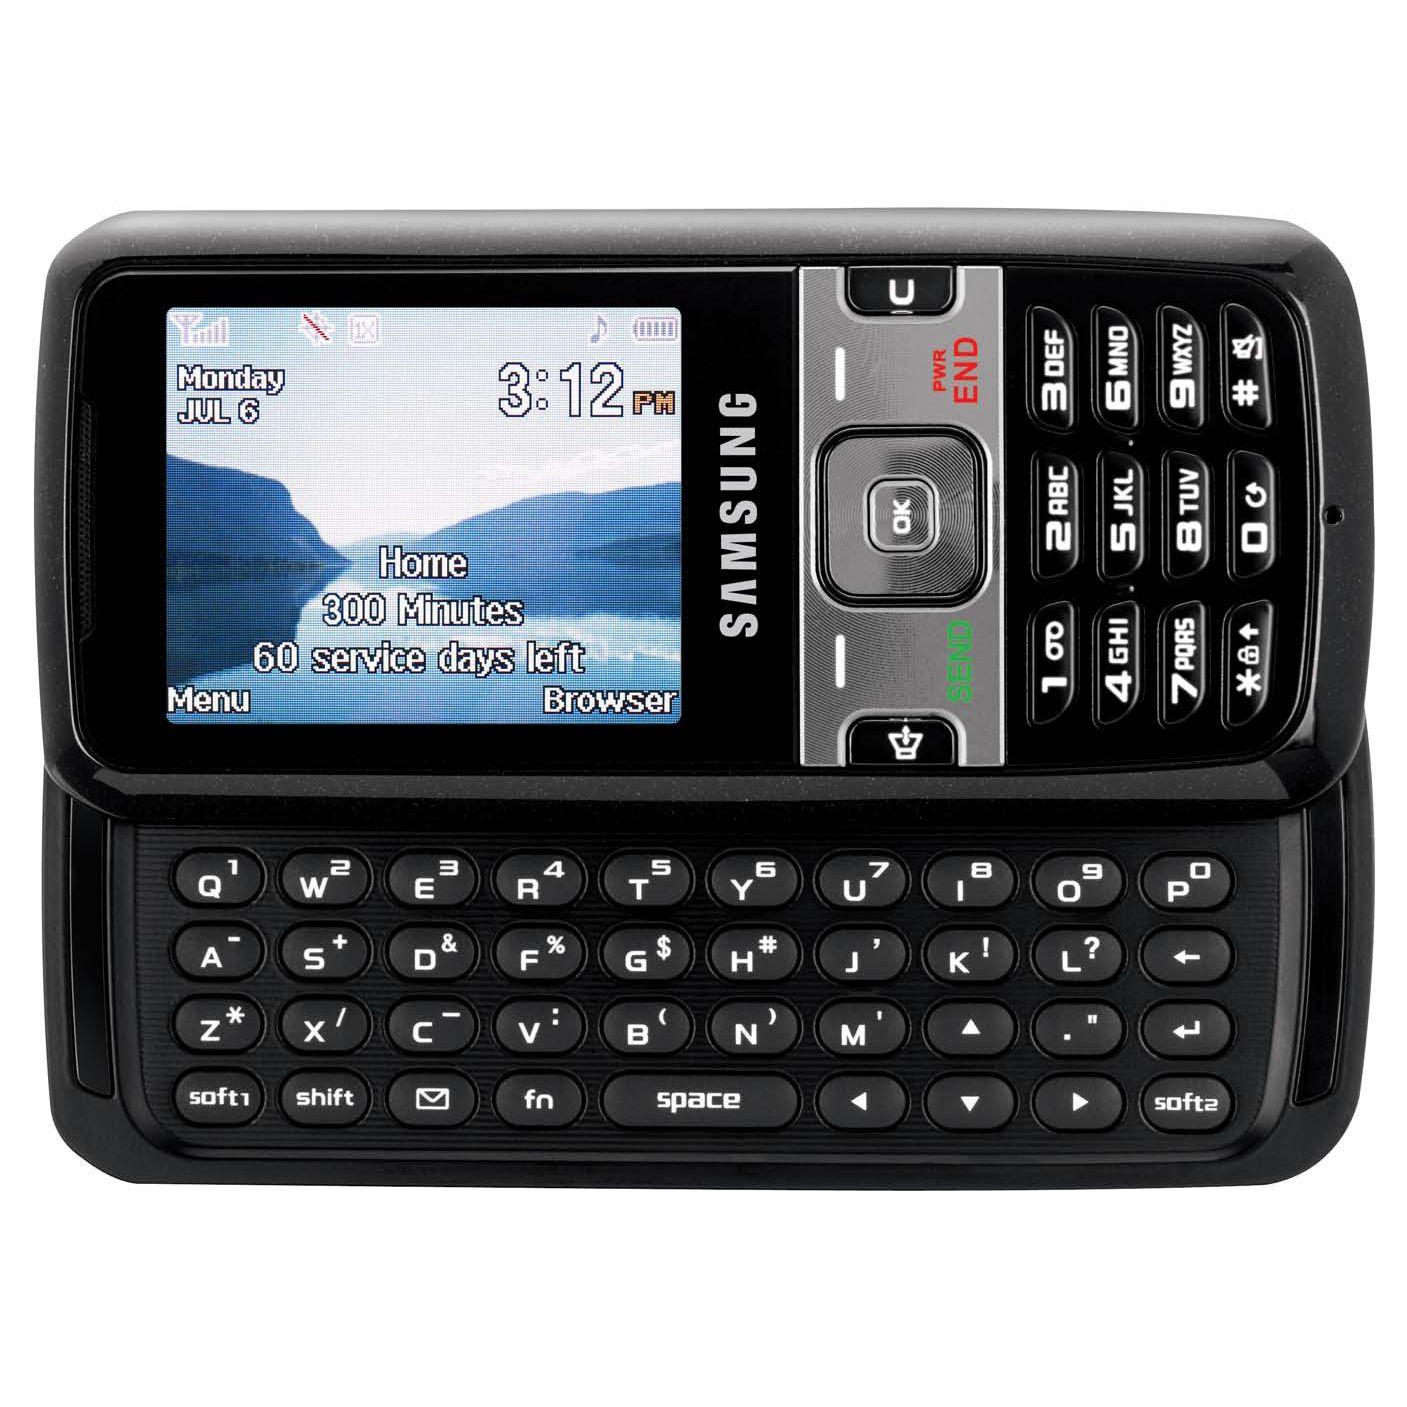 Tracfone Net10 Prepaid Mobile Phone - Samsung R451c Cdma